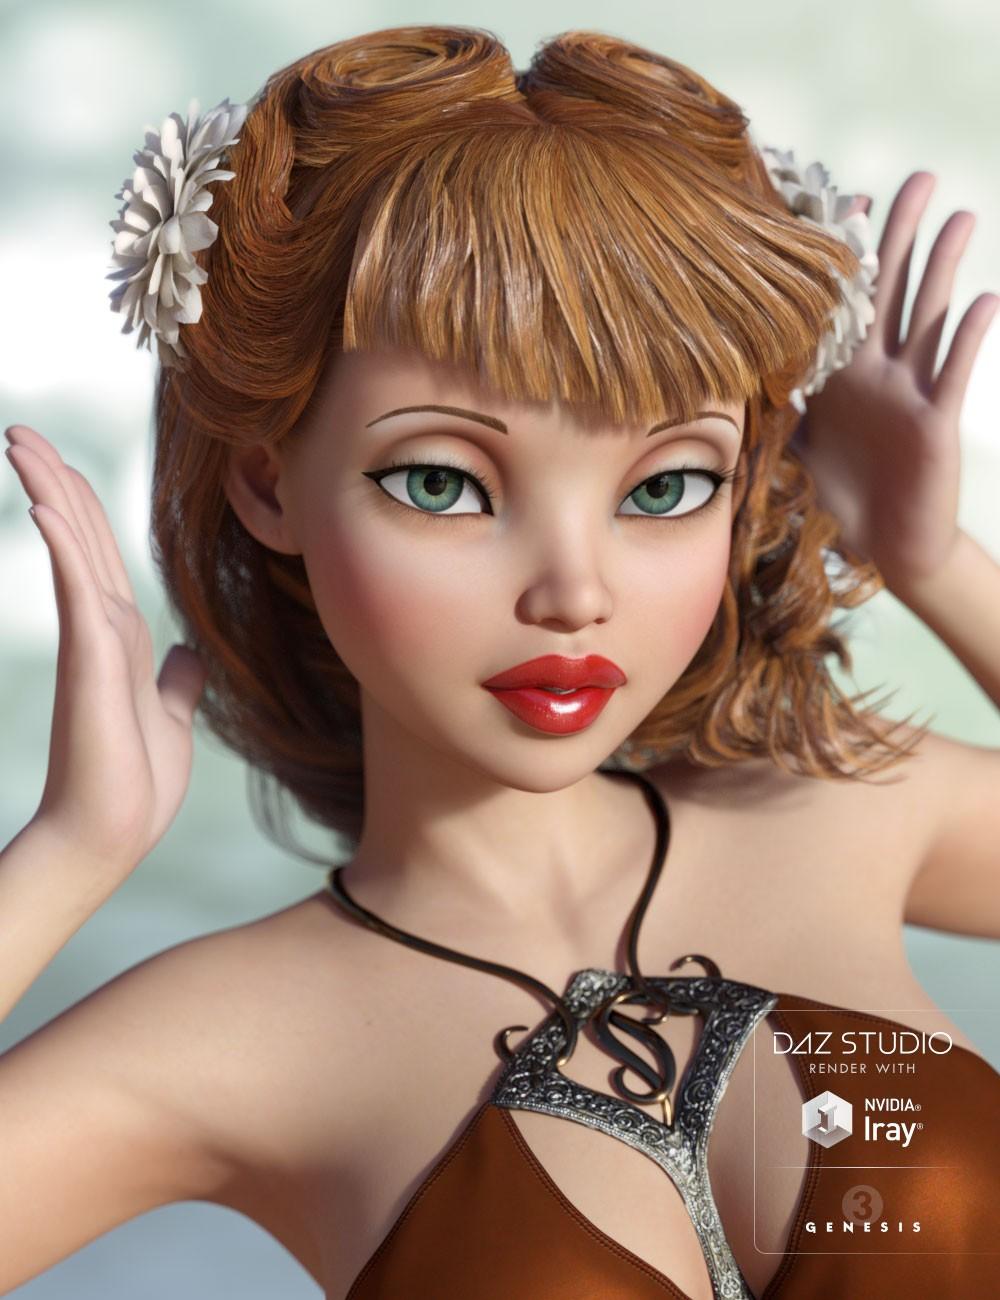 Daz Studio 3 For Free Daz 3d Color Picker For - Imagez co